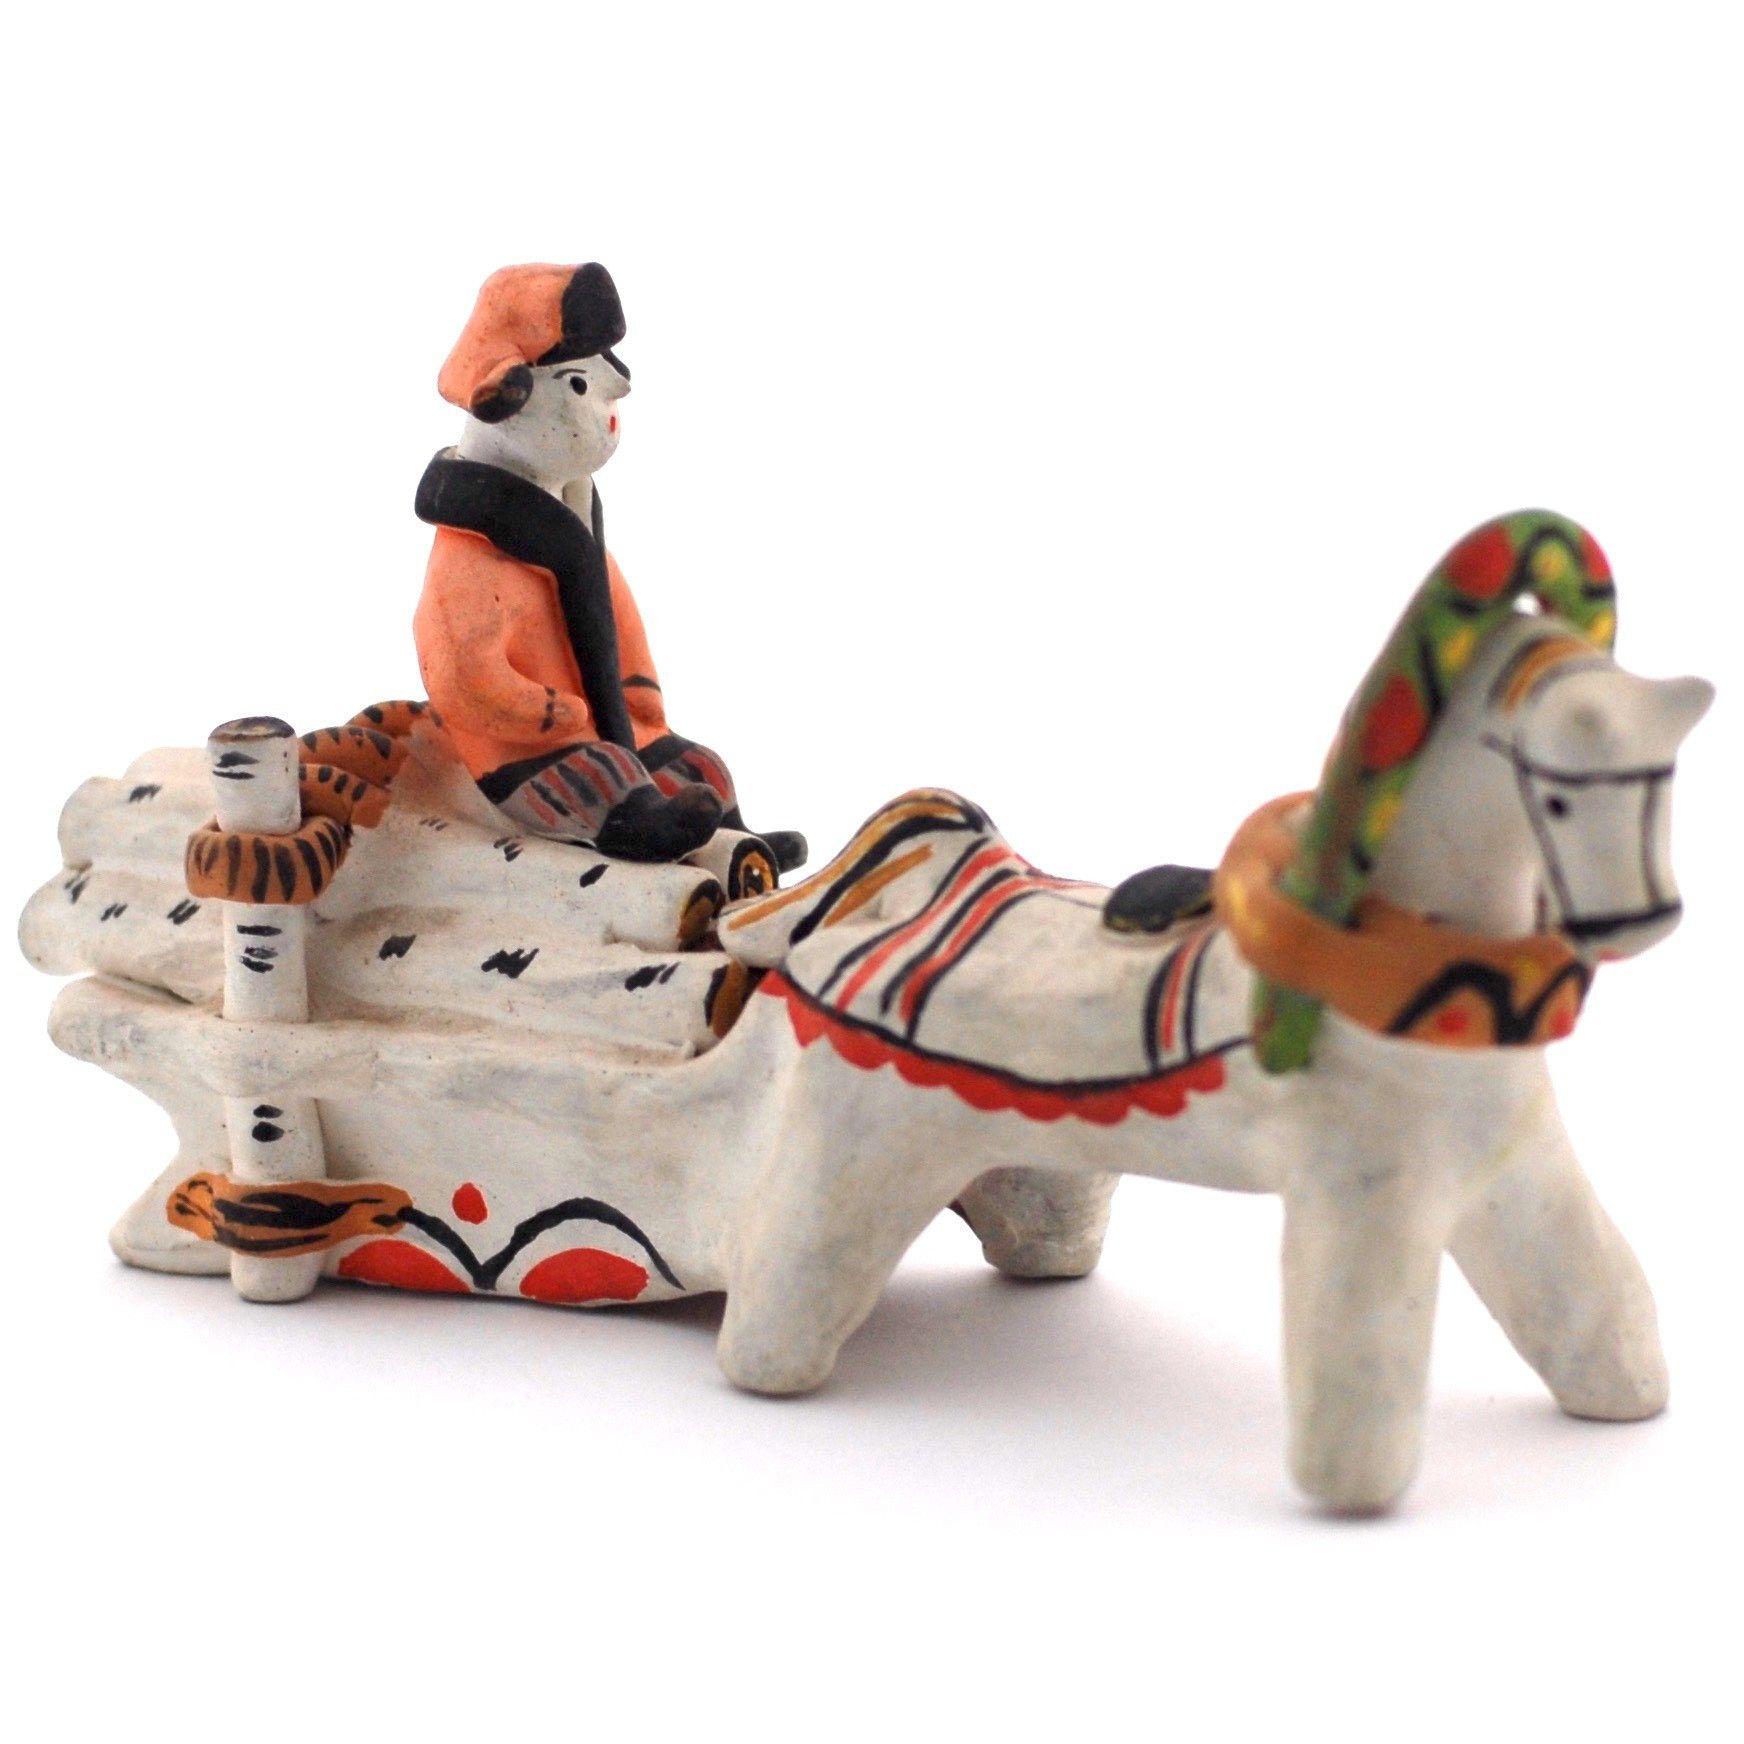 Kargopol clay toy On wood-sledge